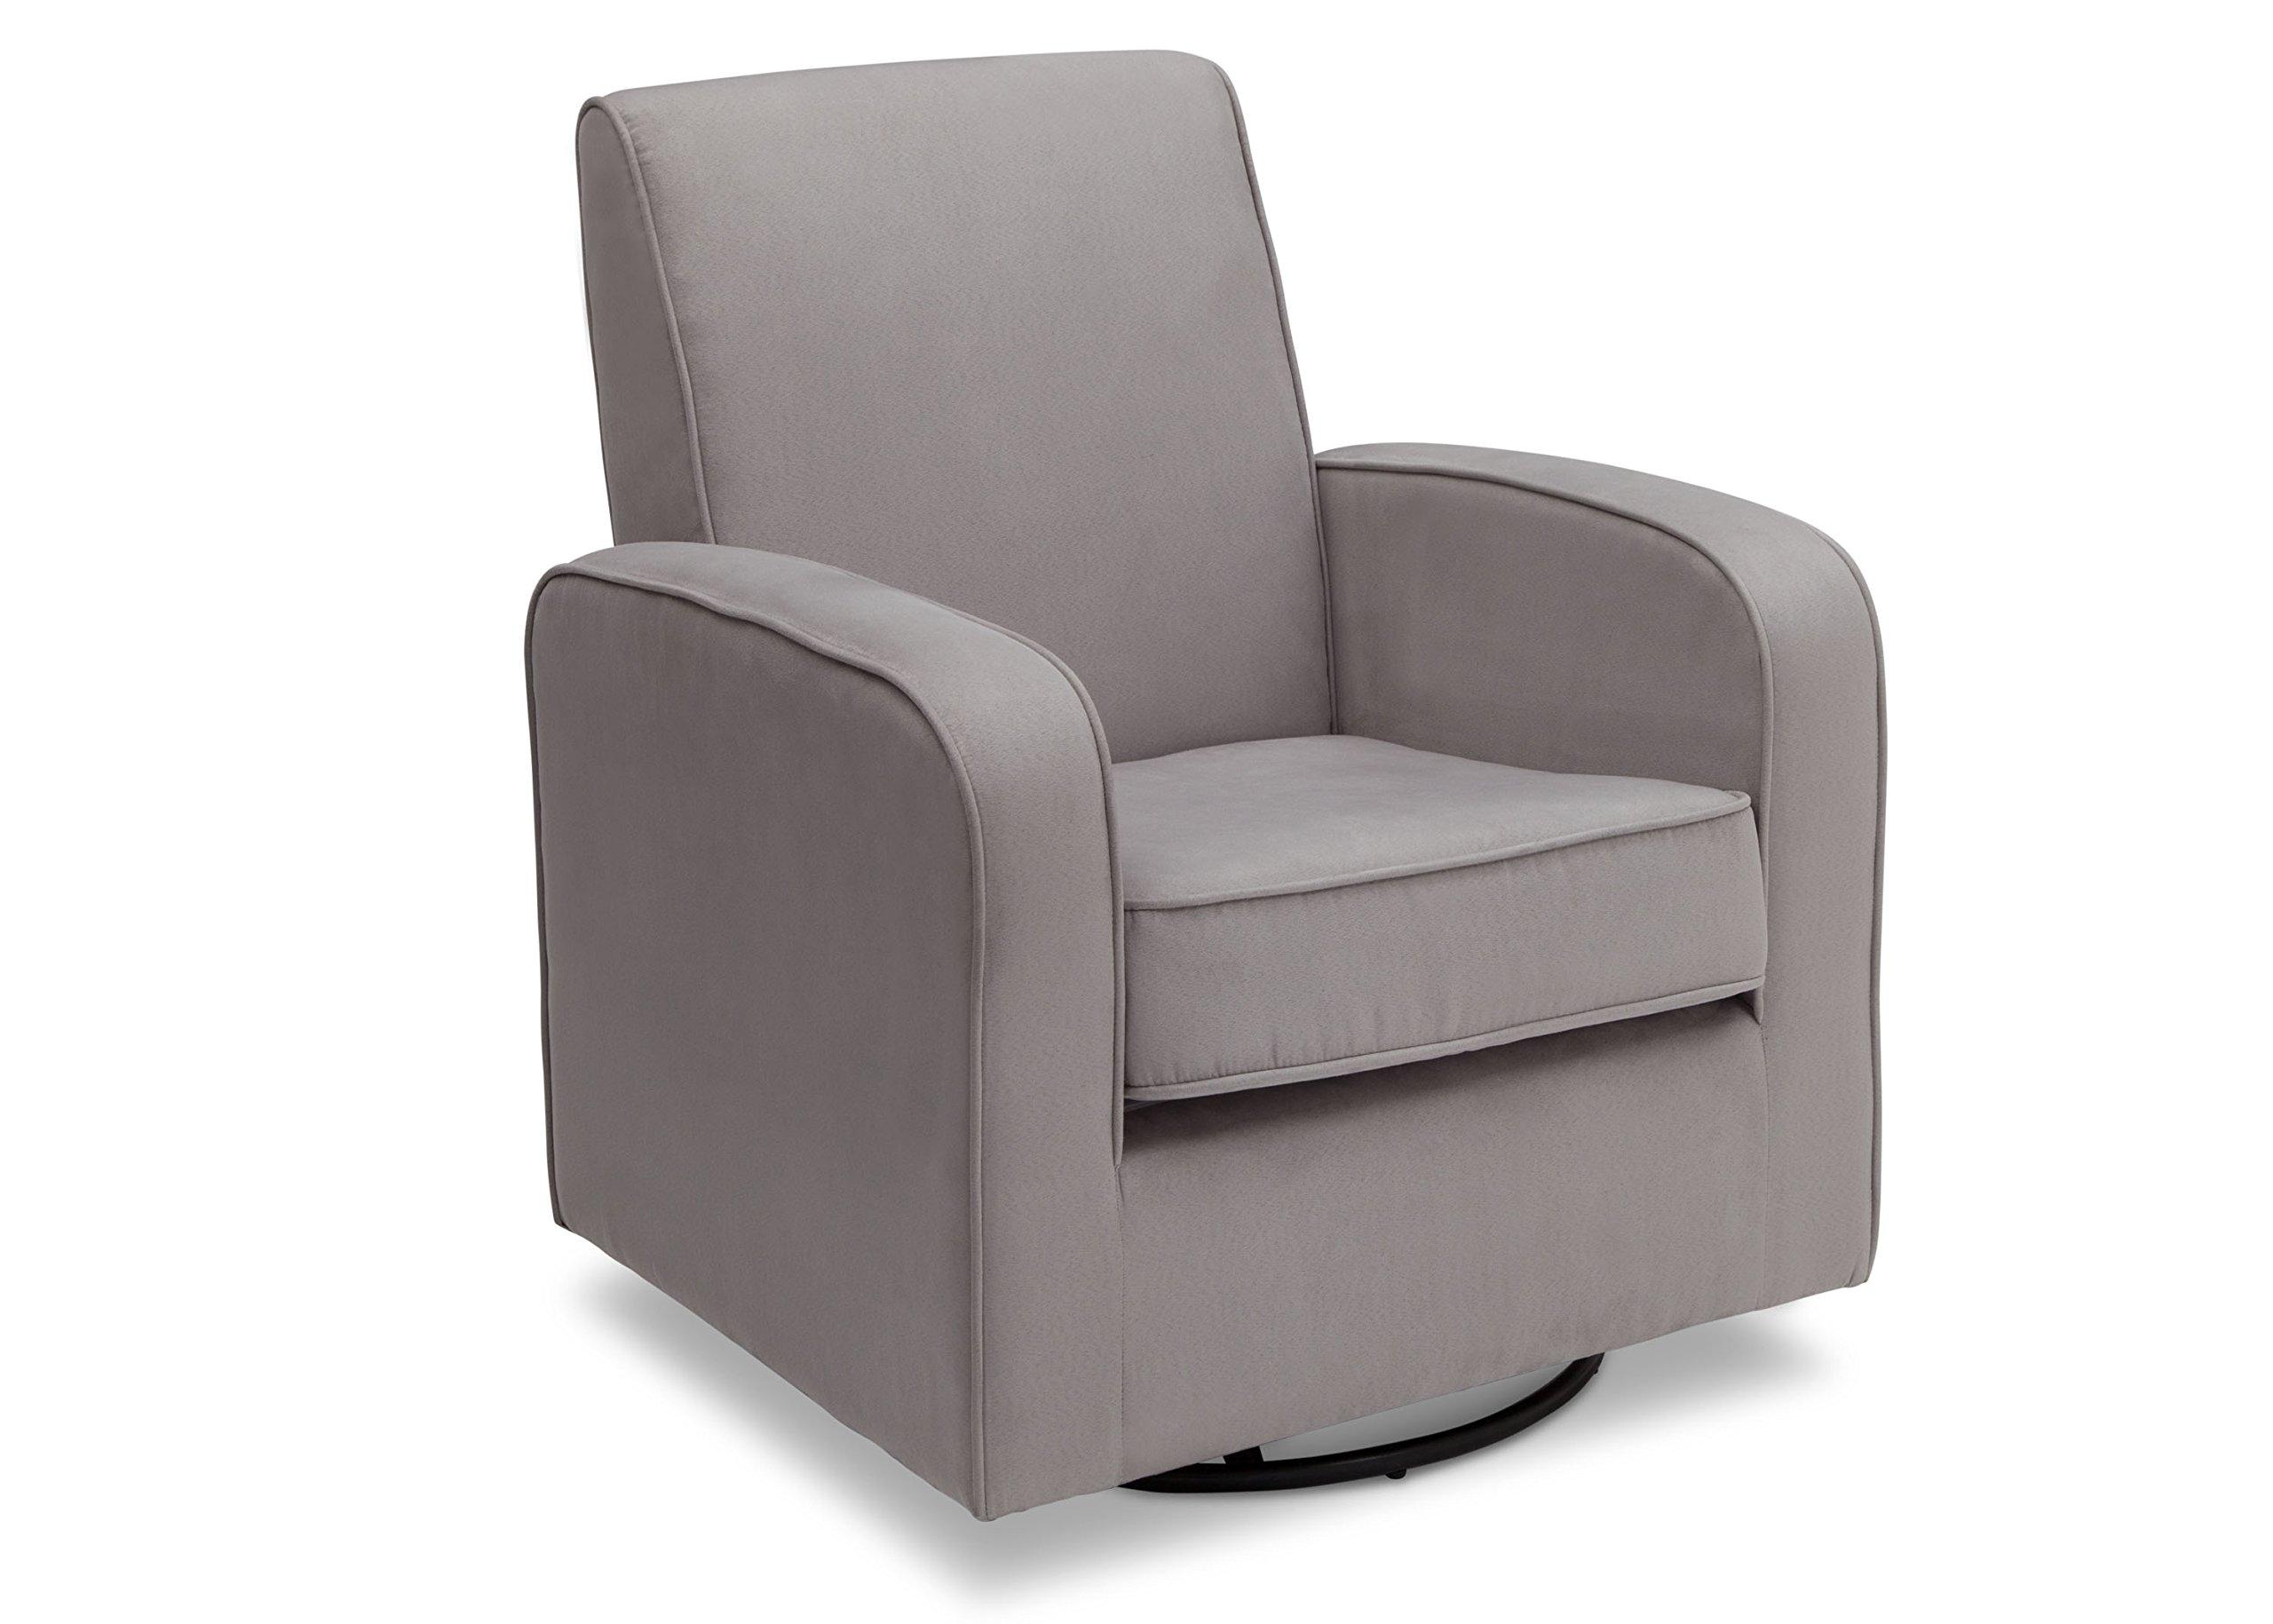 Delta Furniture Chloe Upholstered Glider Swivel Rocker Chair, Grey